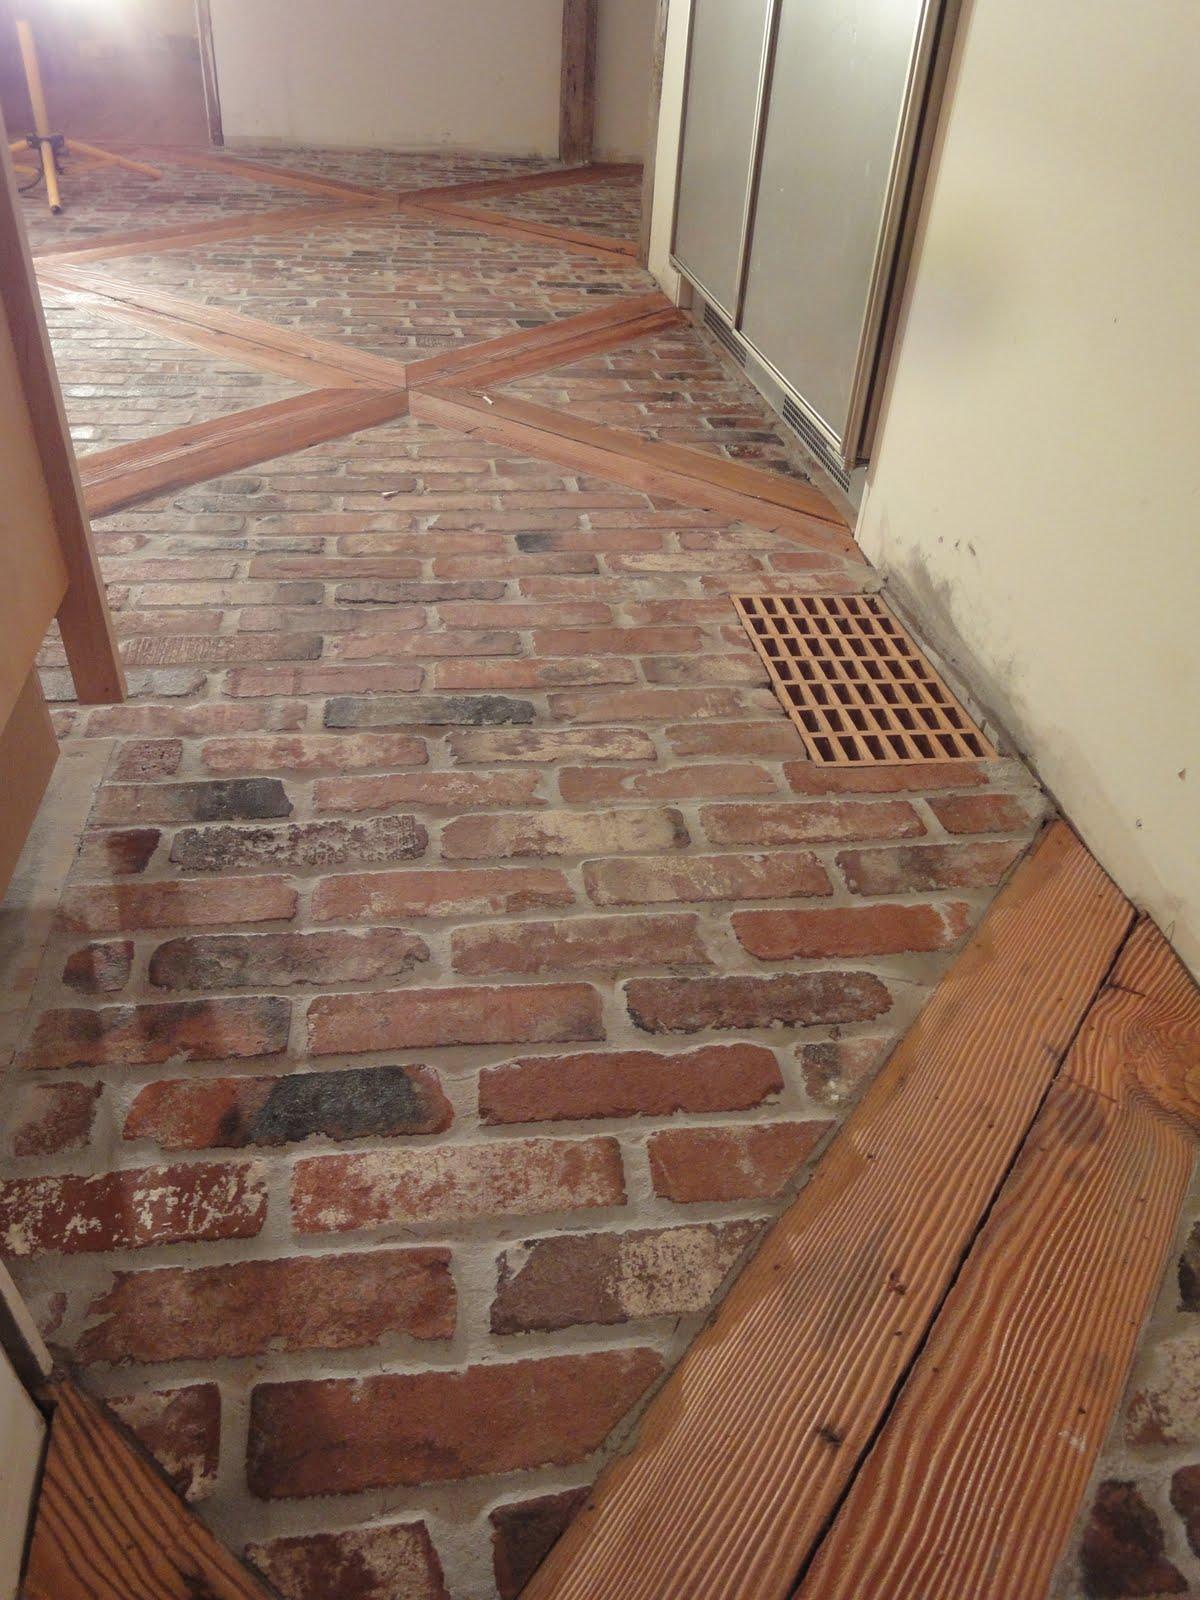 1900 farmhouse kitchen floor - Brick and wood house ...